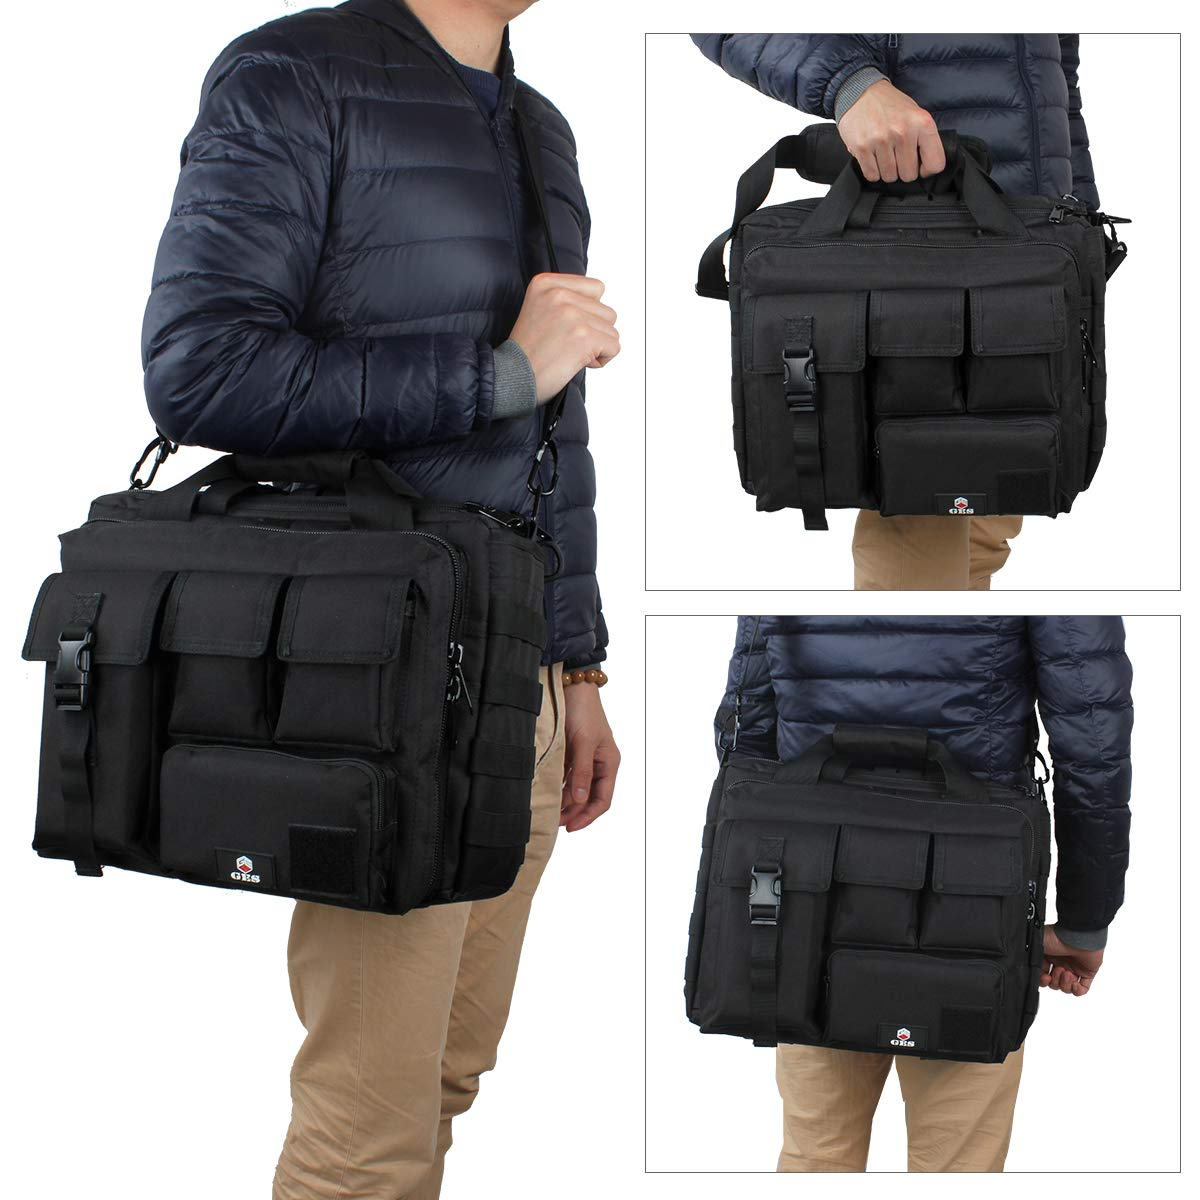 b5dcde849acf GES Laptop Bag - 15.6 Inch Men's Messenger Bag Multifunction ...